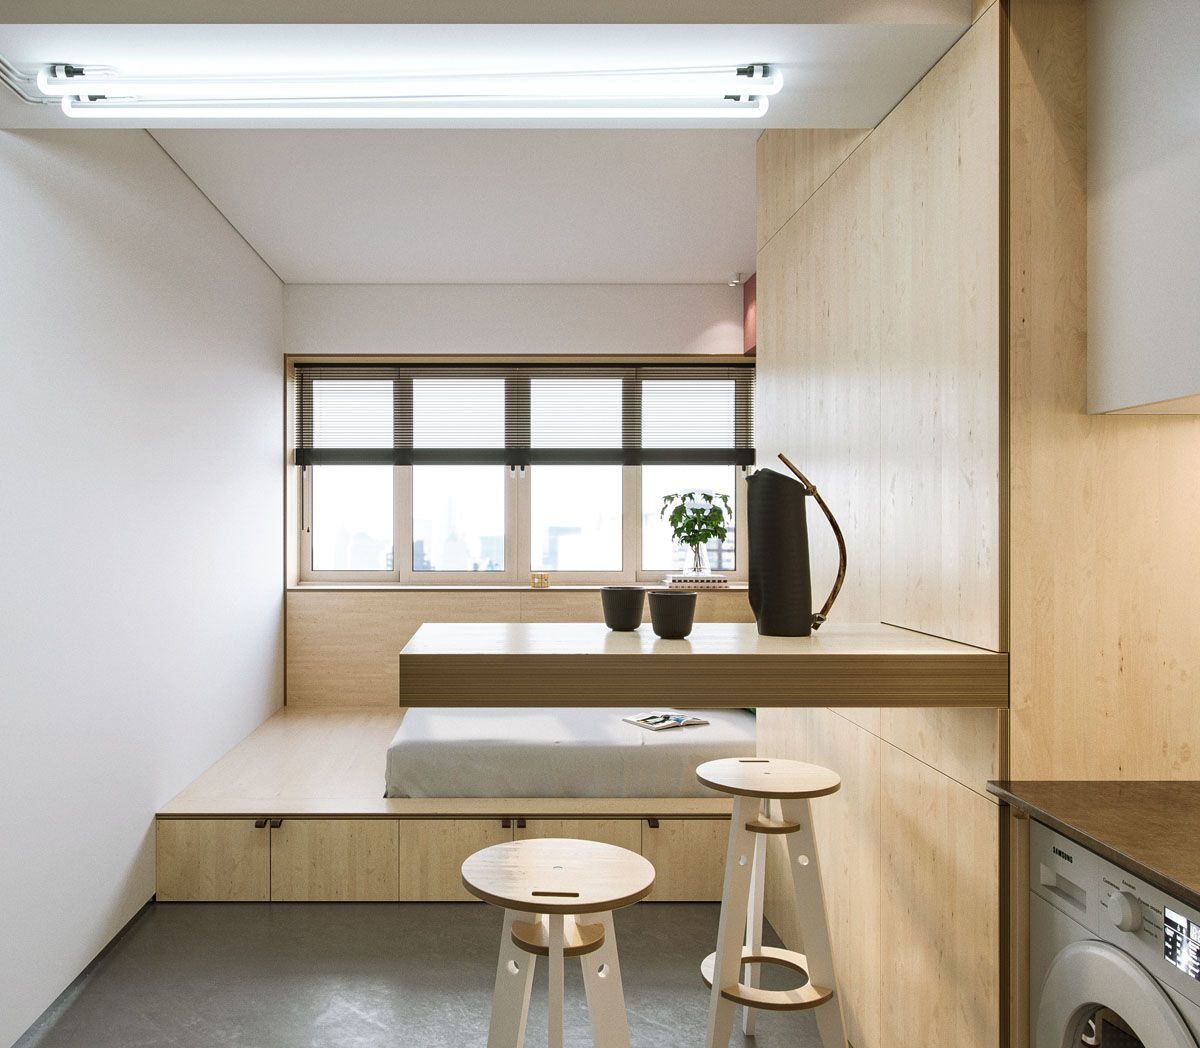 Super Compact Spaces A Minimalist Studio Apartment Under